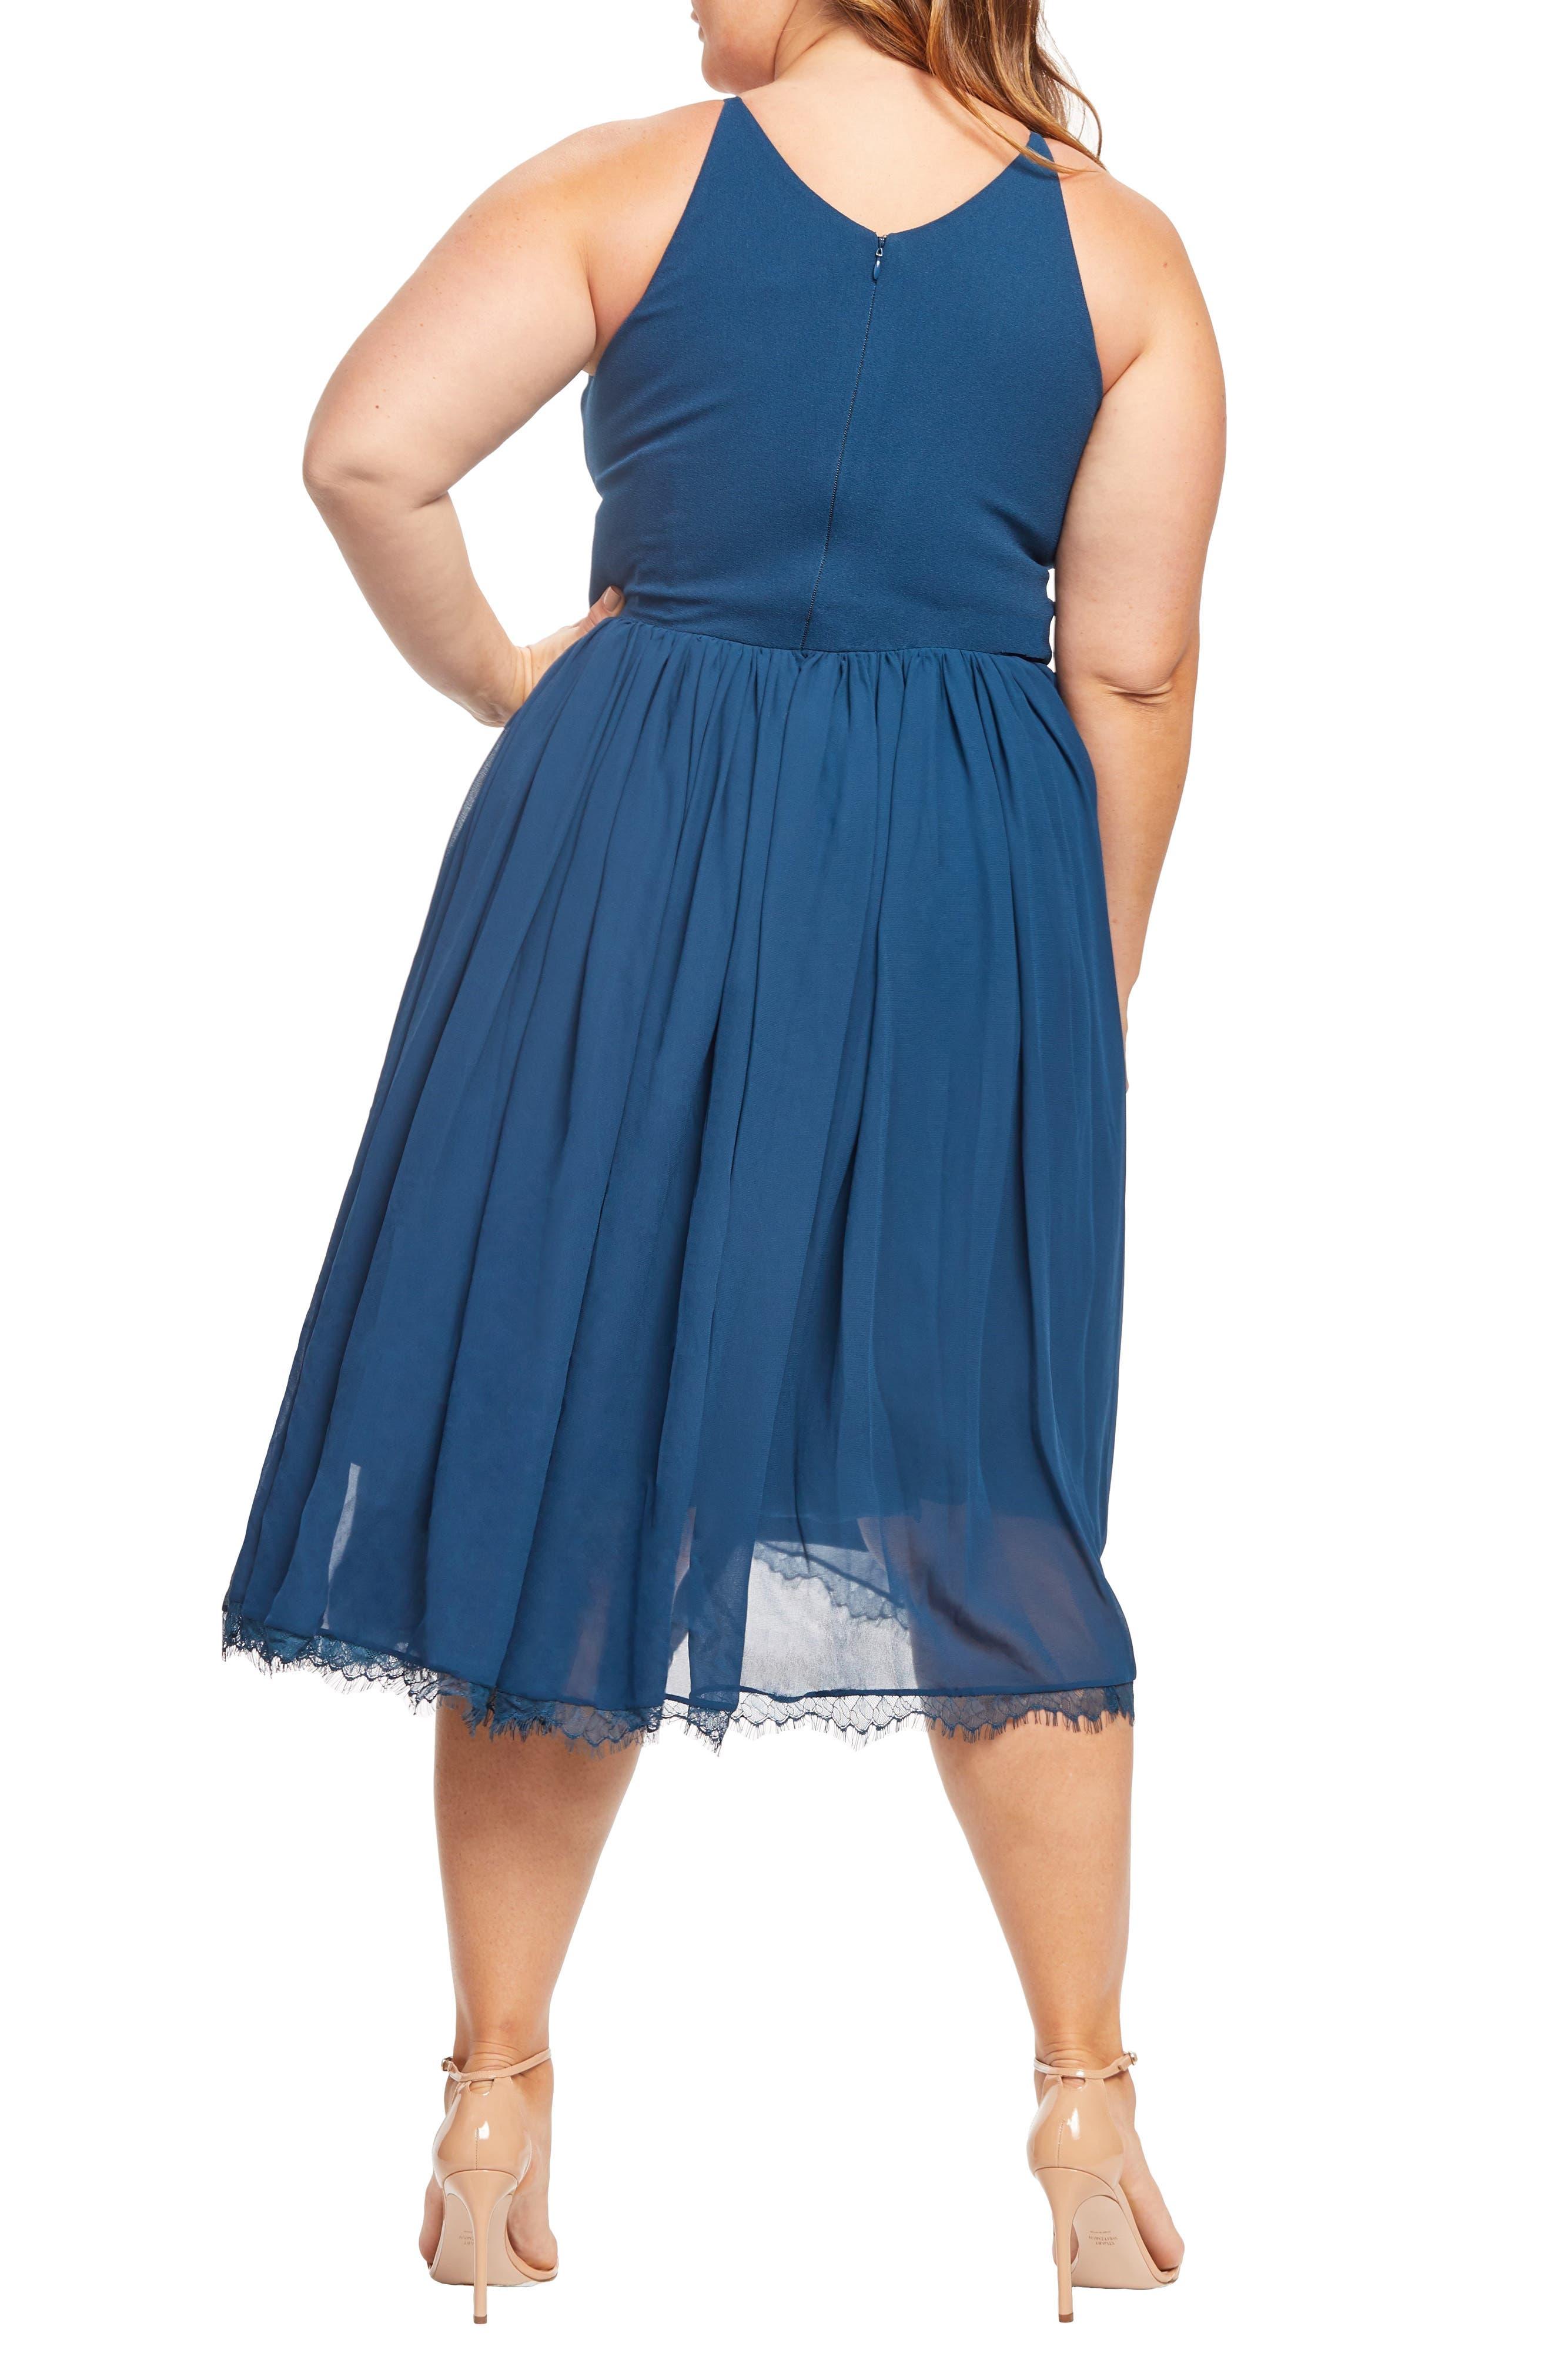 Alicia Mixed Media Midi Dress,                             Alternate thumbnail 2, color,                             PEACOCK BLUE